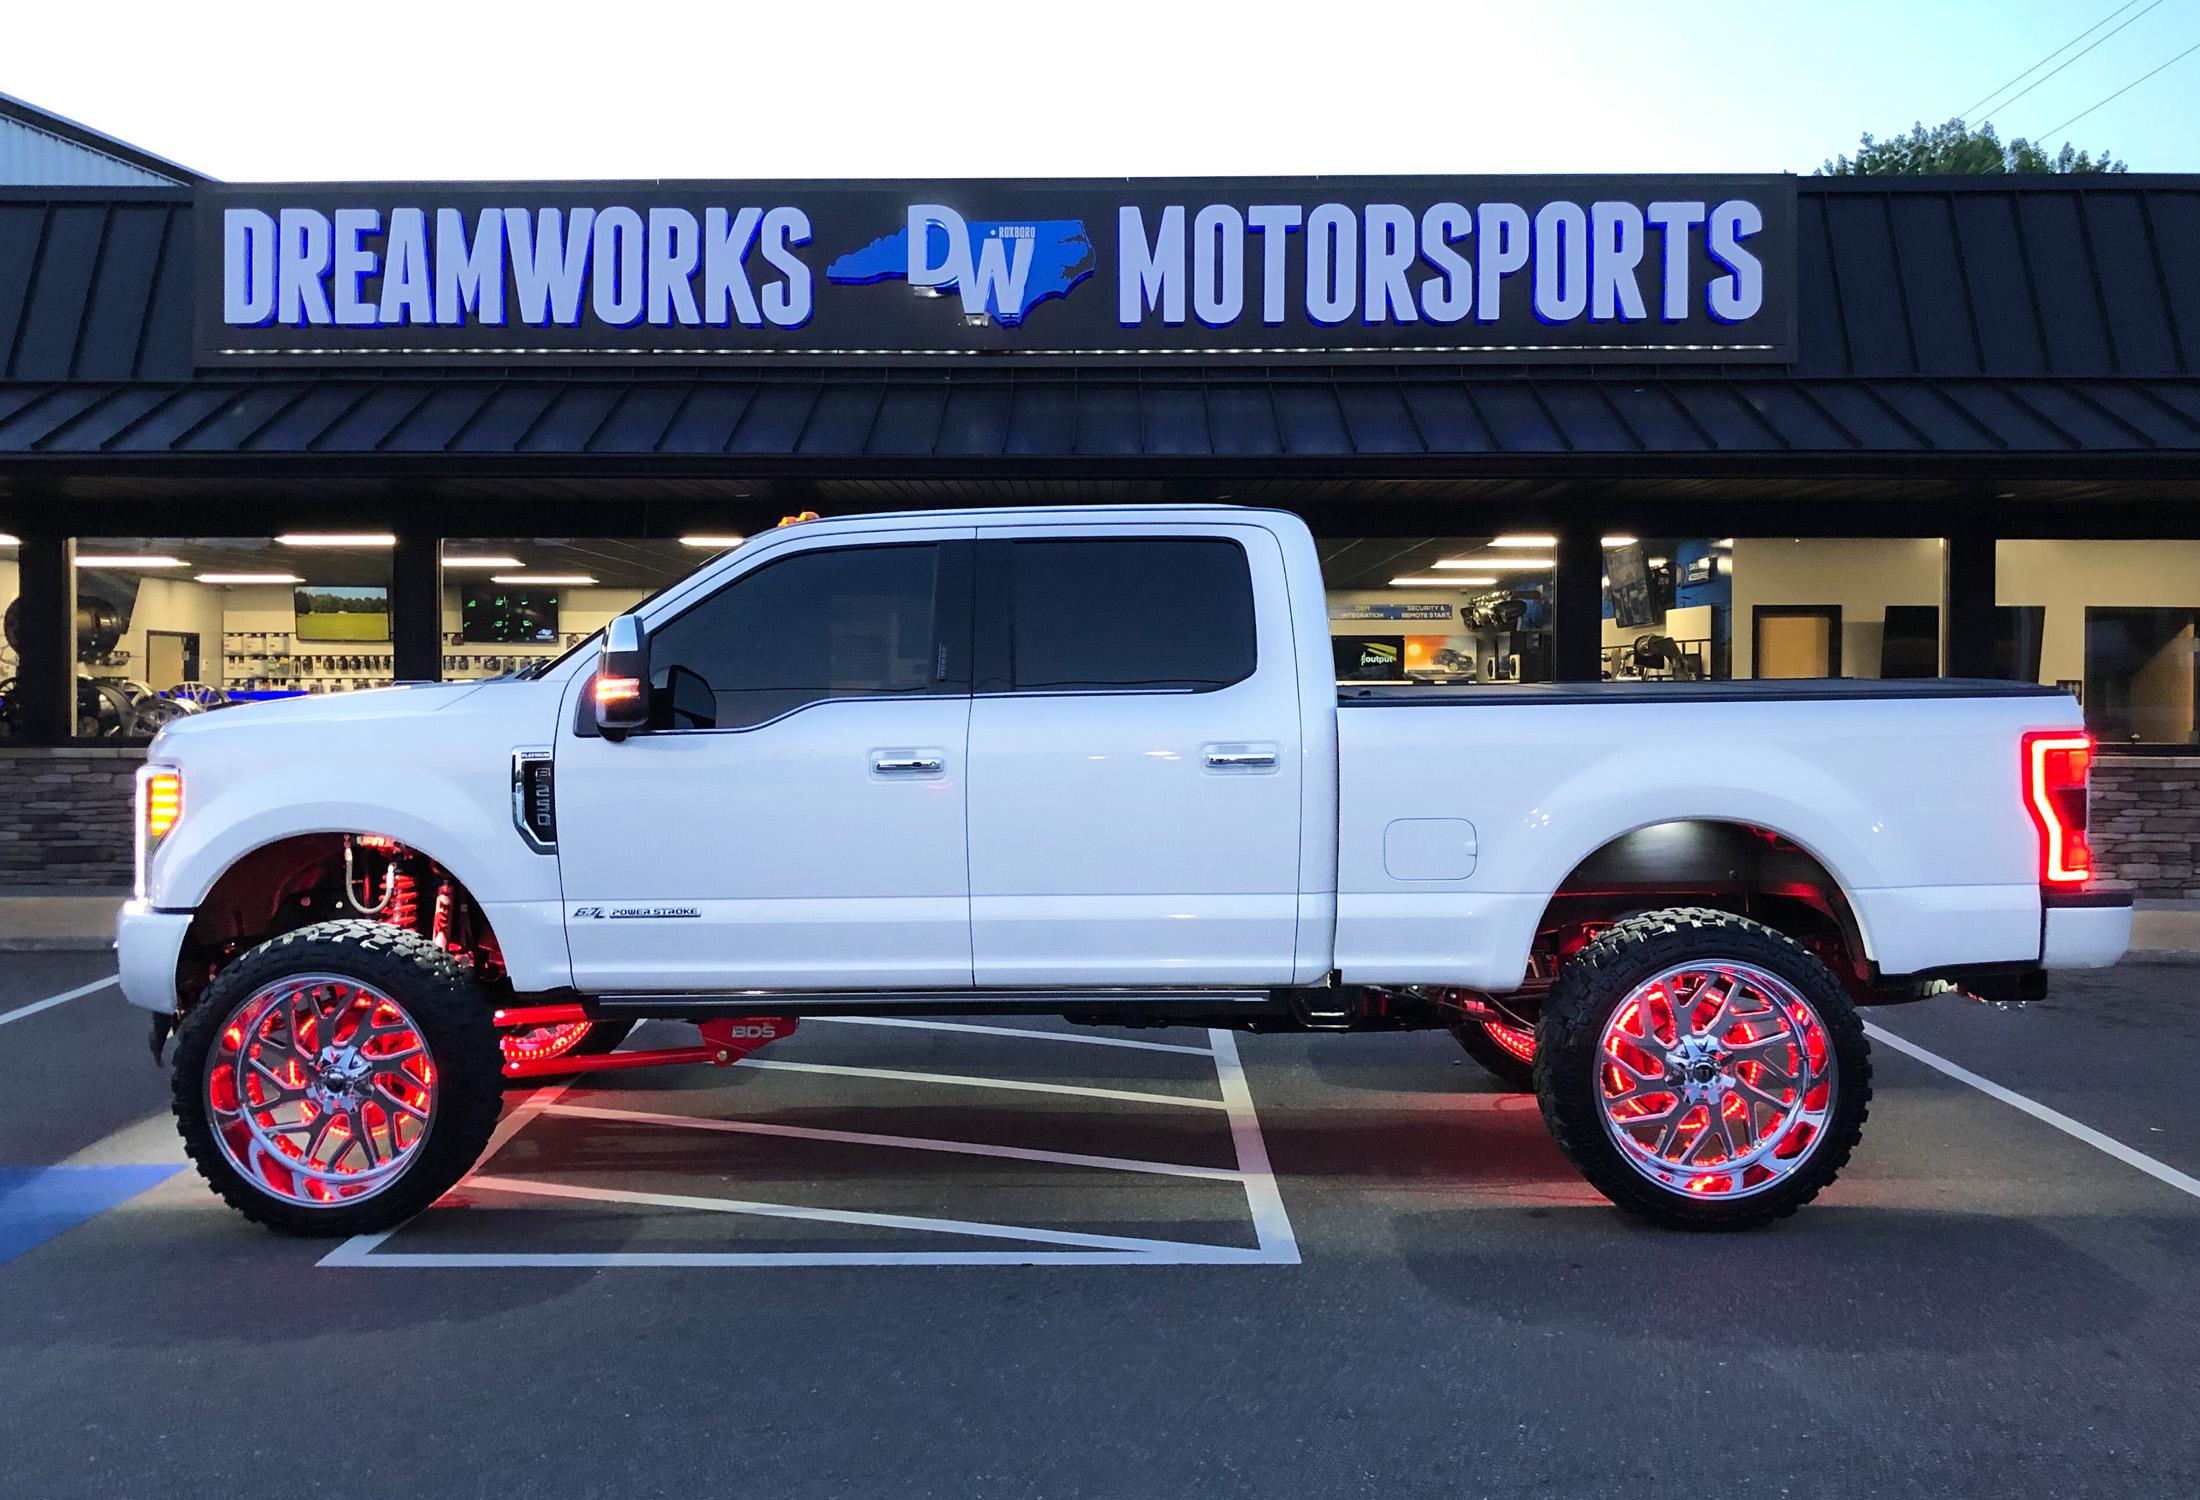 Devin-White-Tampa-Bay-Bucs-NFL-Ford-Truck-Dreamworks-Motorsports.jpg